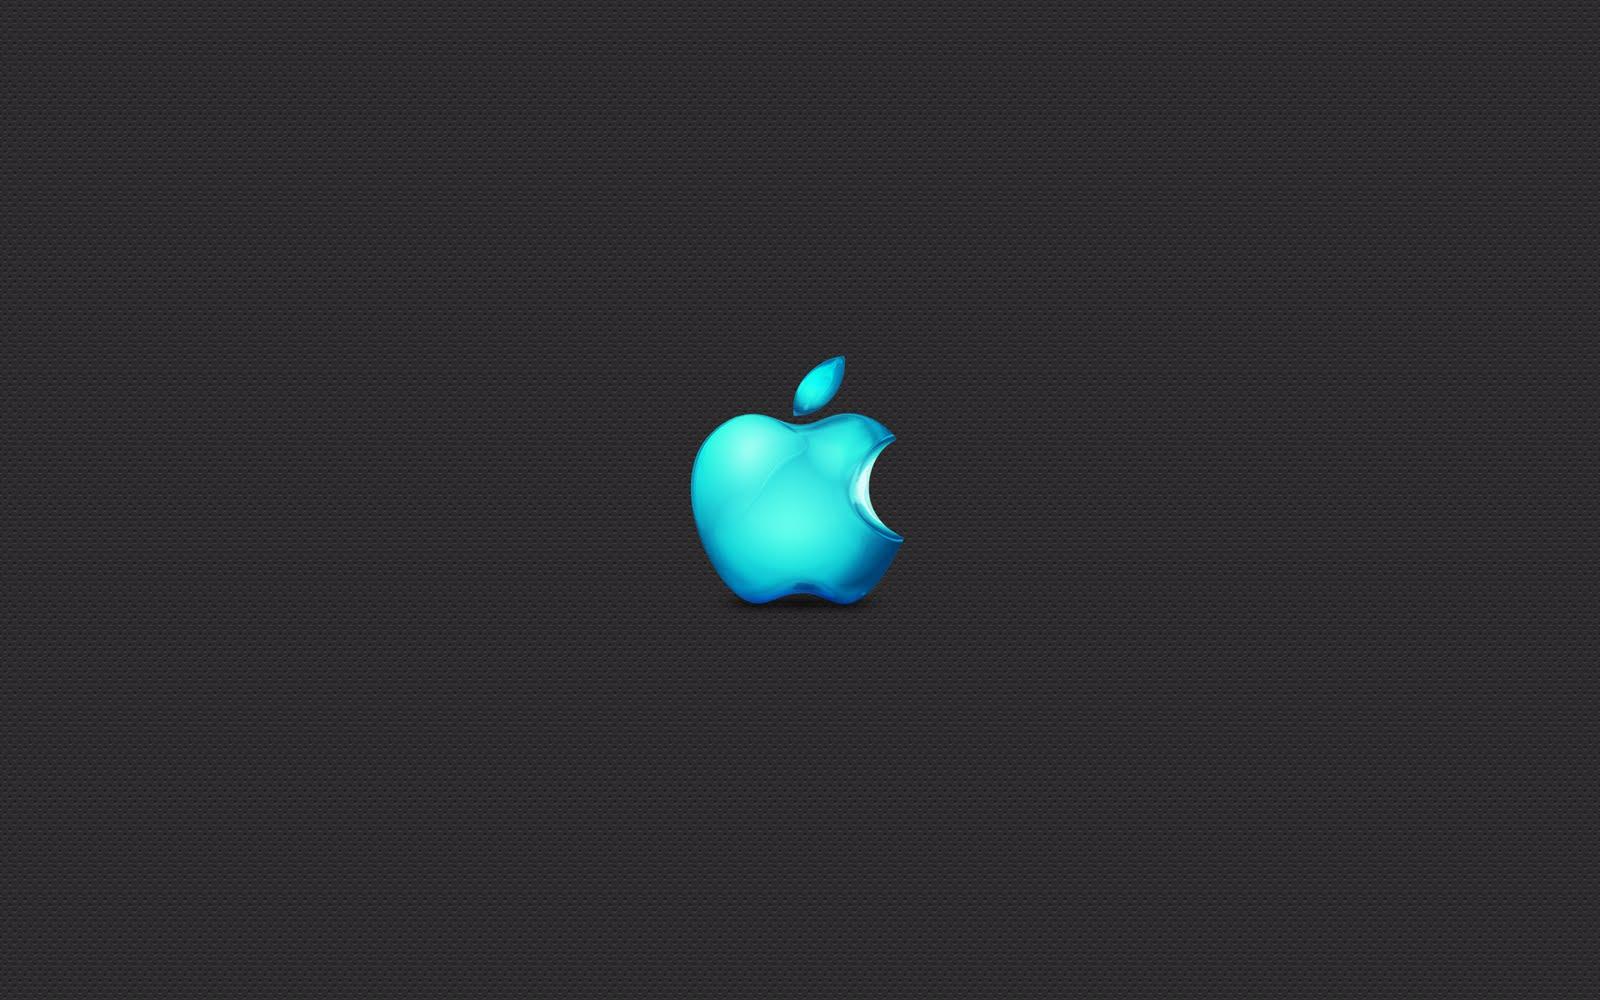 hd wallpapers apple logo hd wallpapers